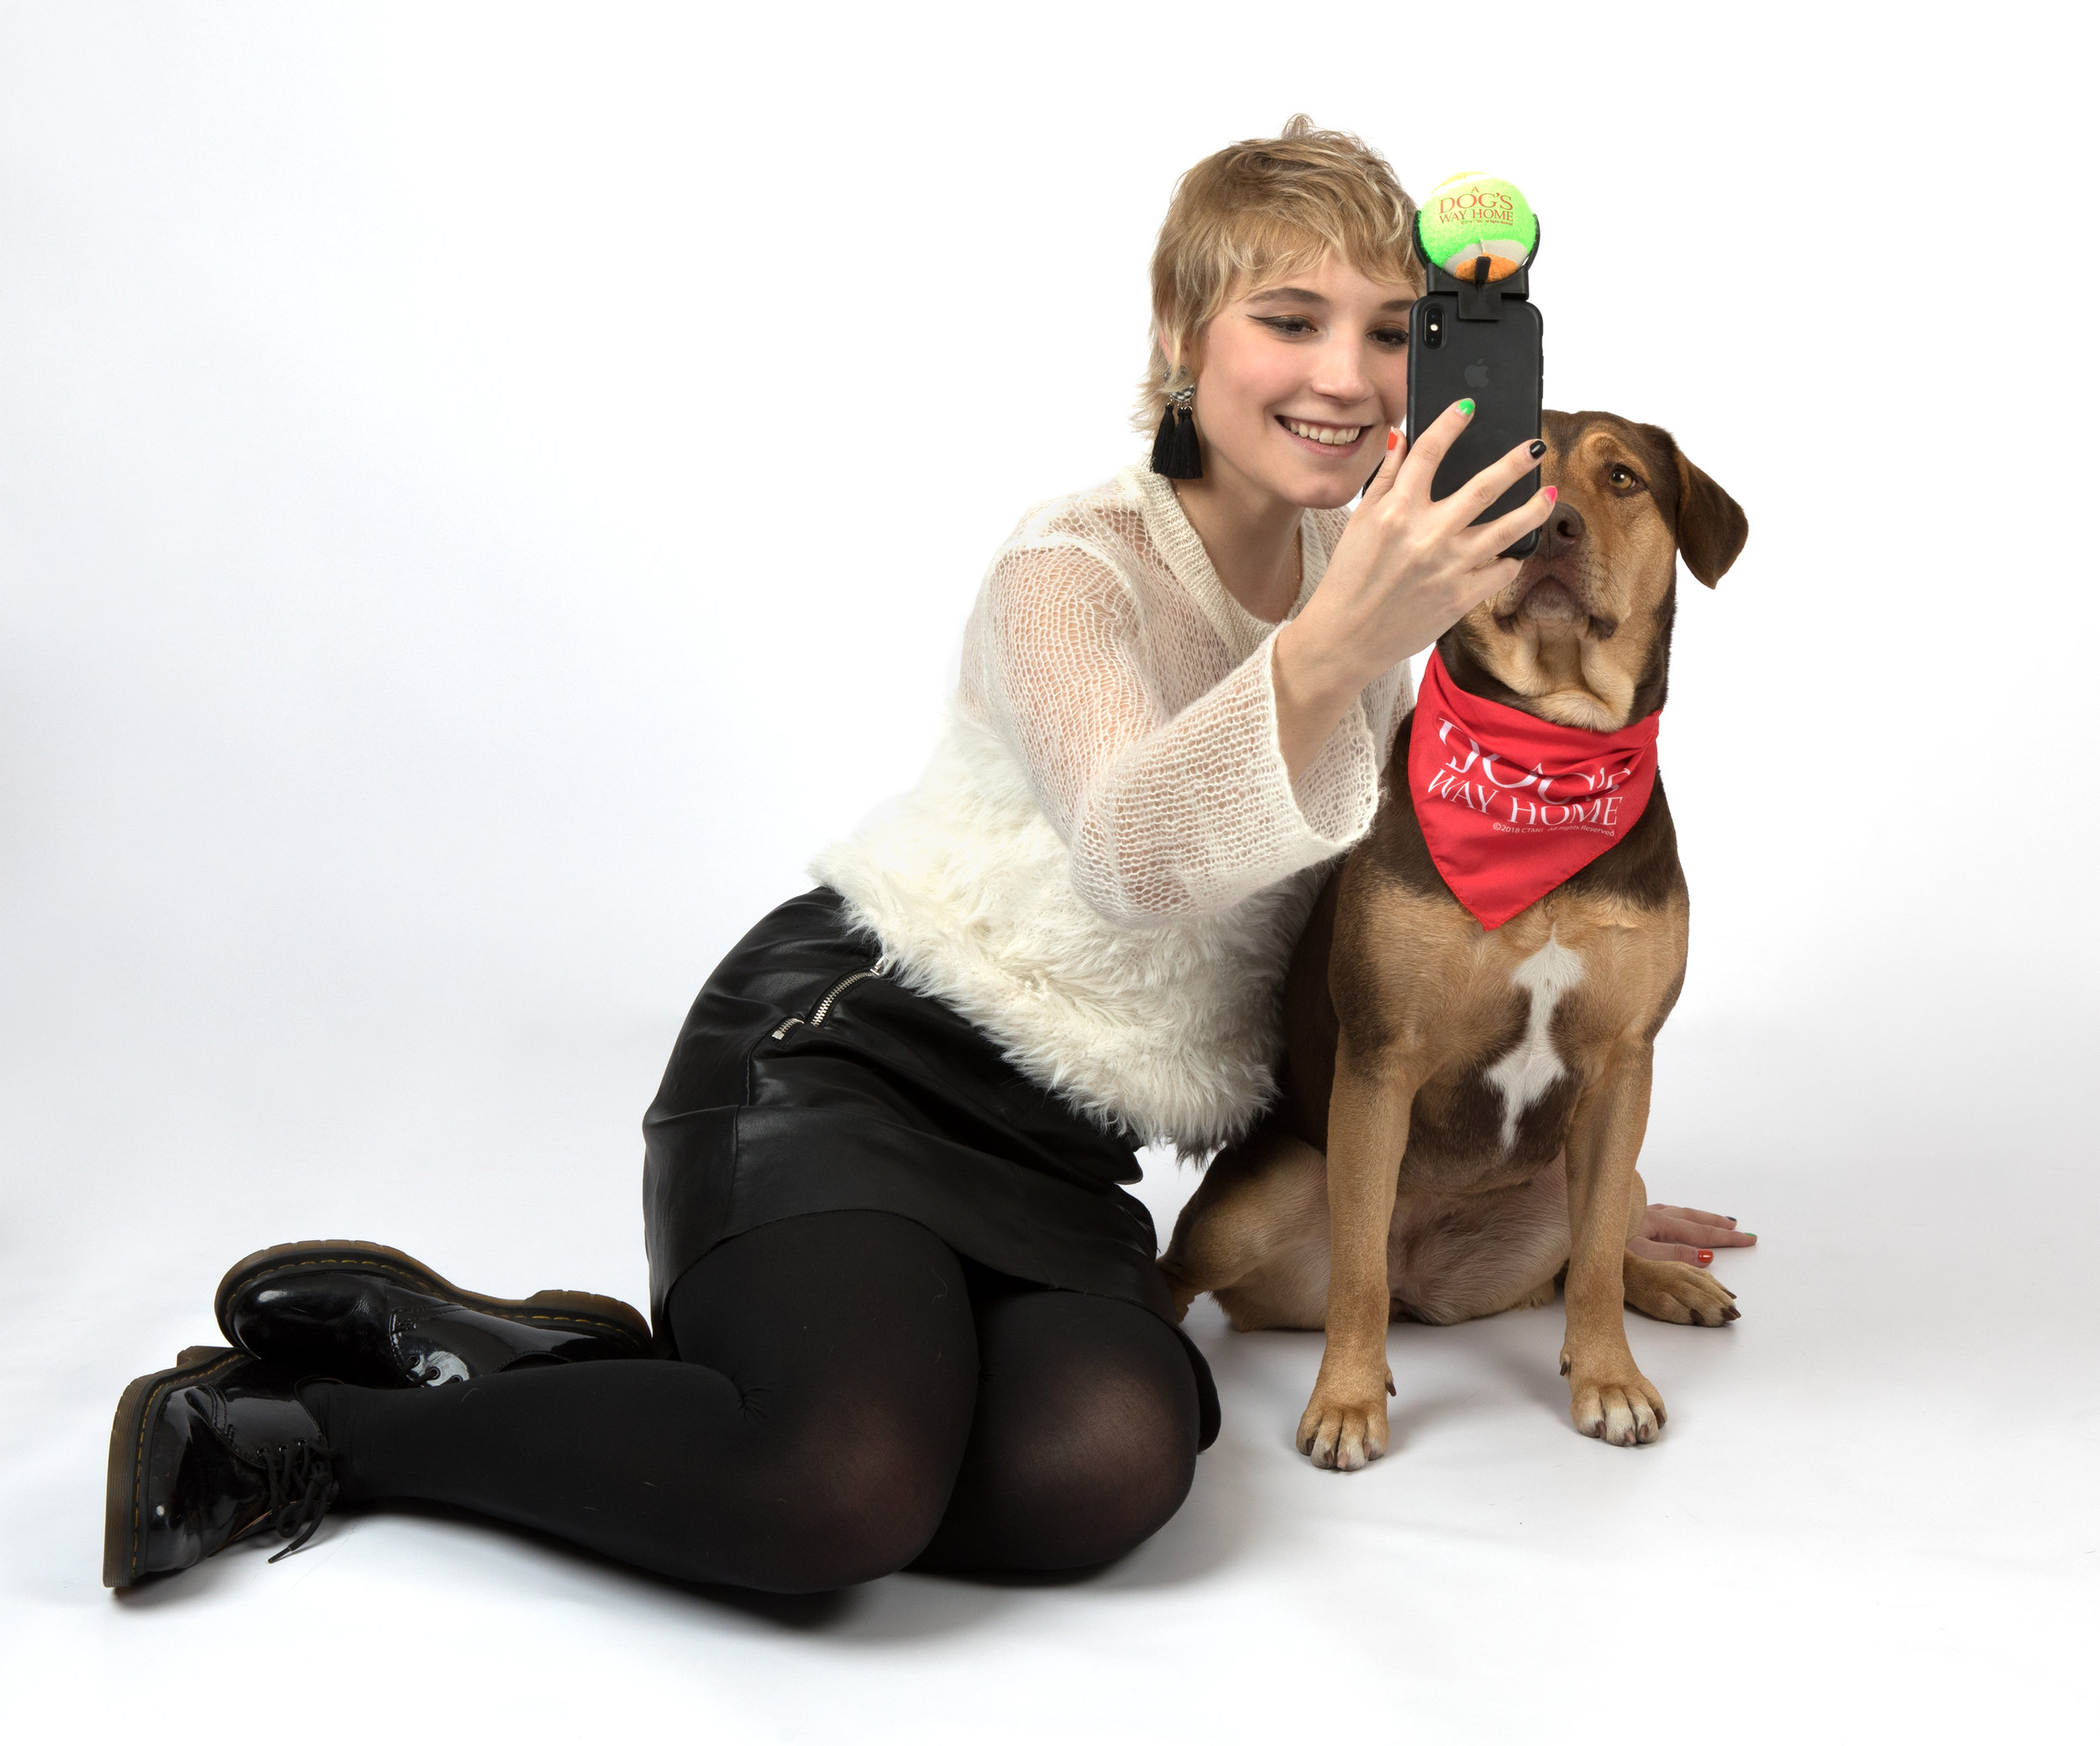 A Dogs Way_Press Junket_Danielle_Spires-1572.jpg